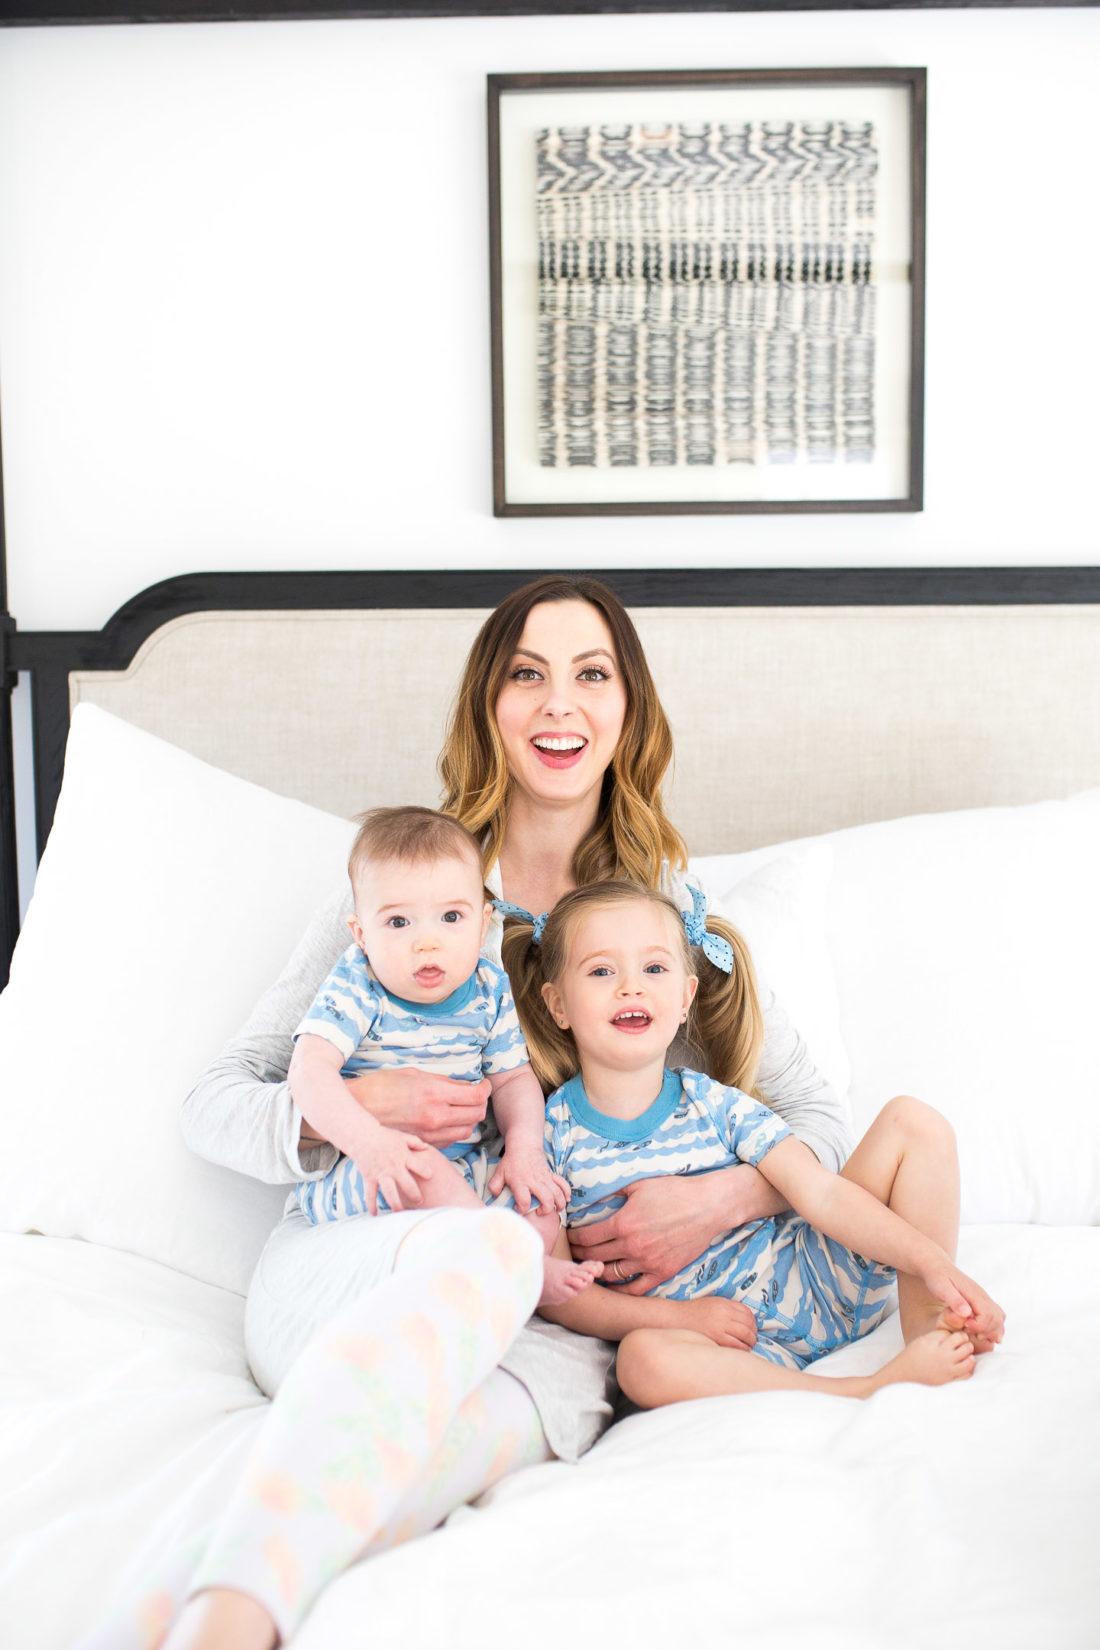 Eva Amurri Martino sits in bed with her two children wearing matching pajamas